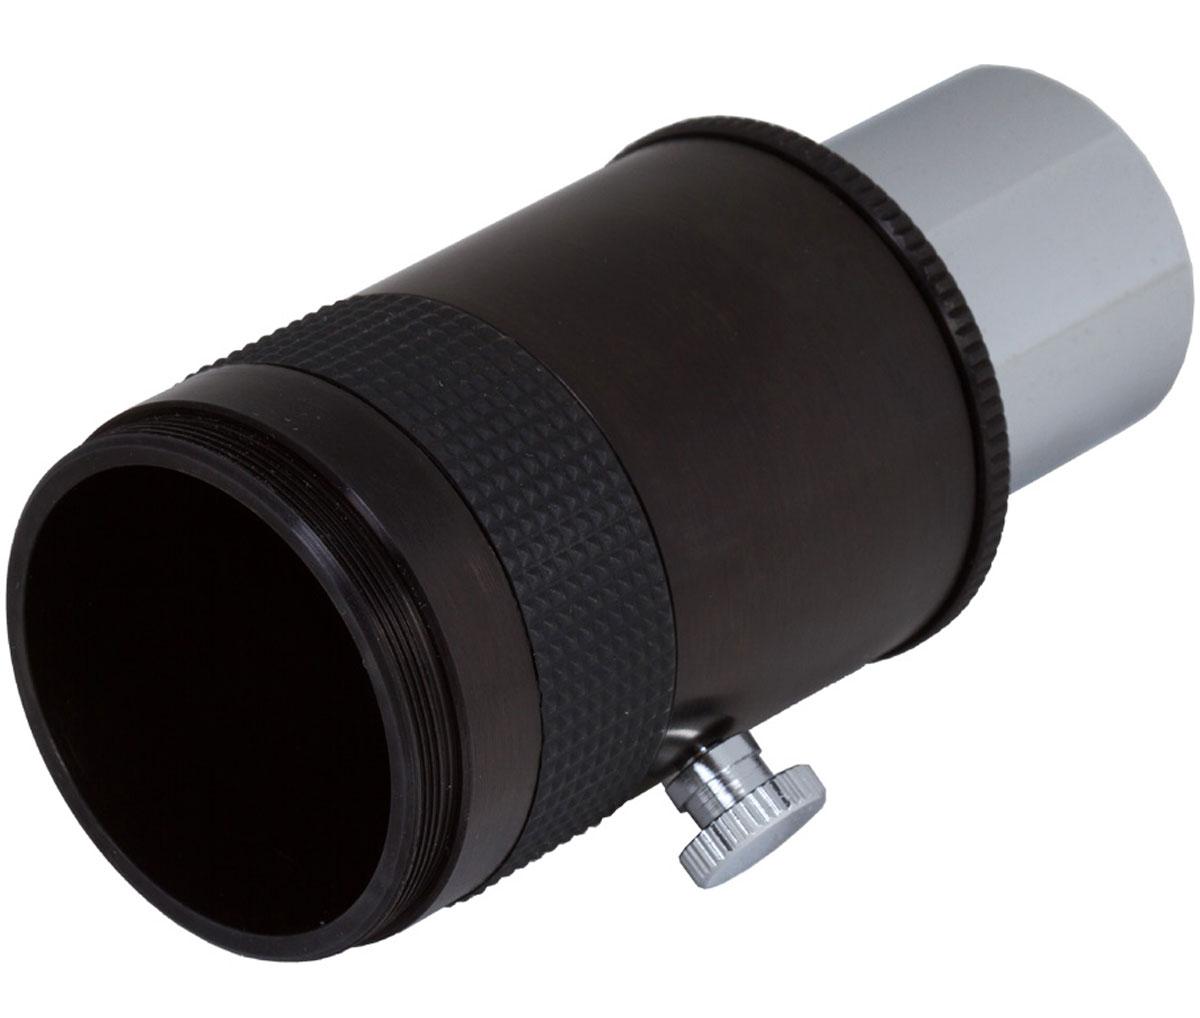 Bresser 69822 фотоадаптер для телескопов 1,25  - Аксессуары для телескопа